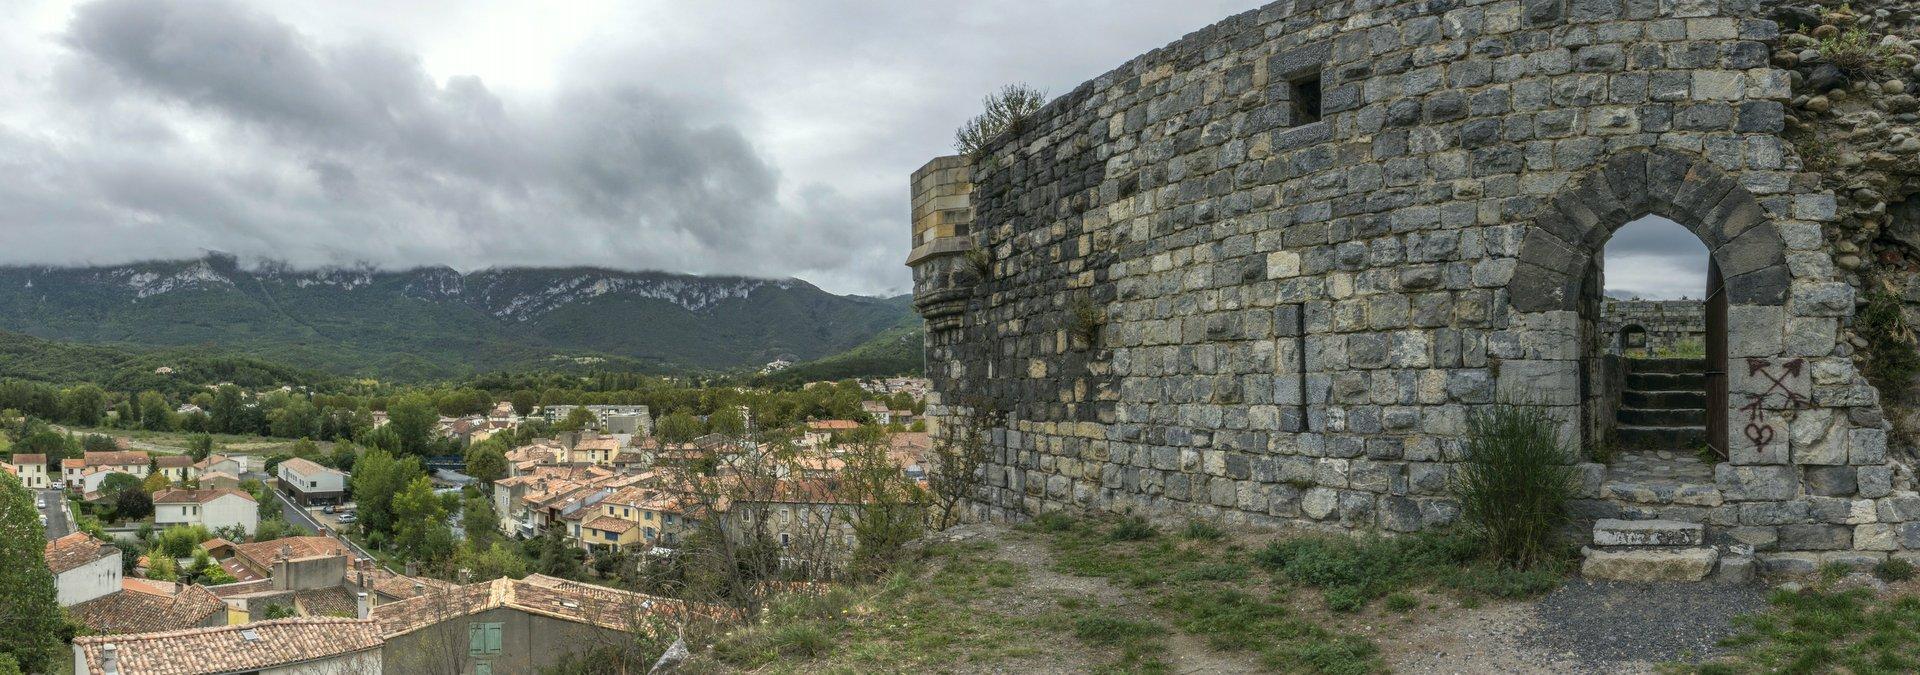 Château de Quillan in Quillan